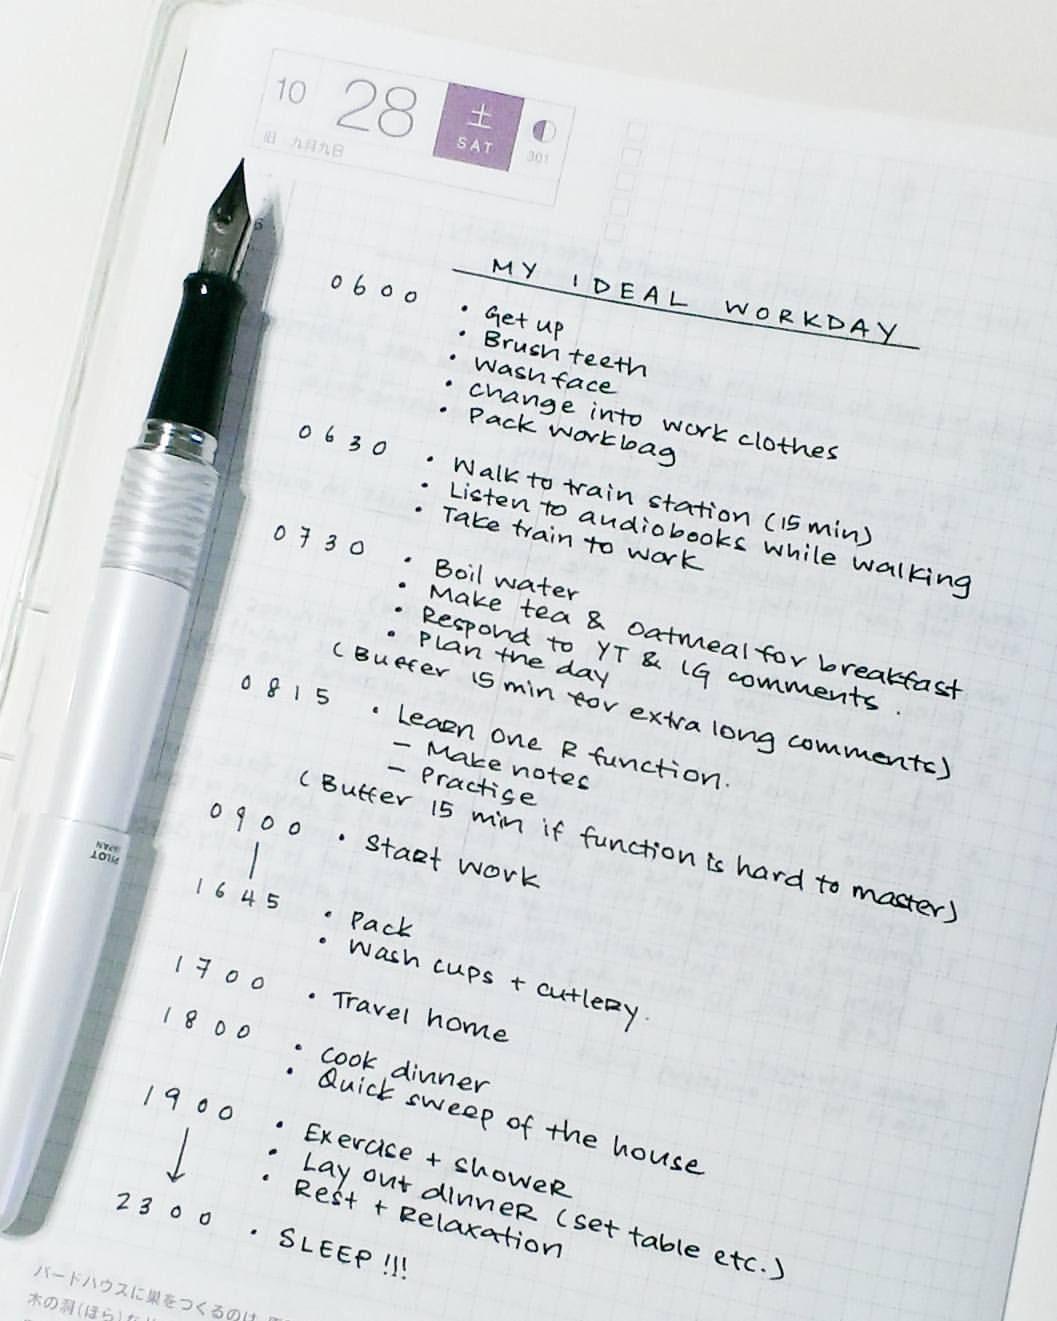 Top argumentative essay proofreading services for school